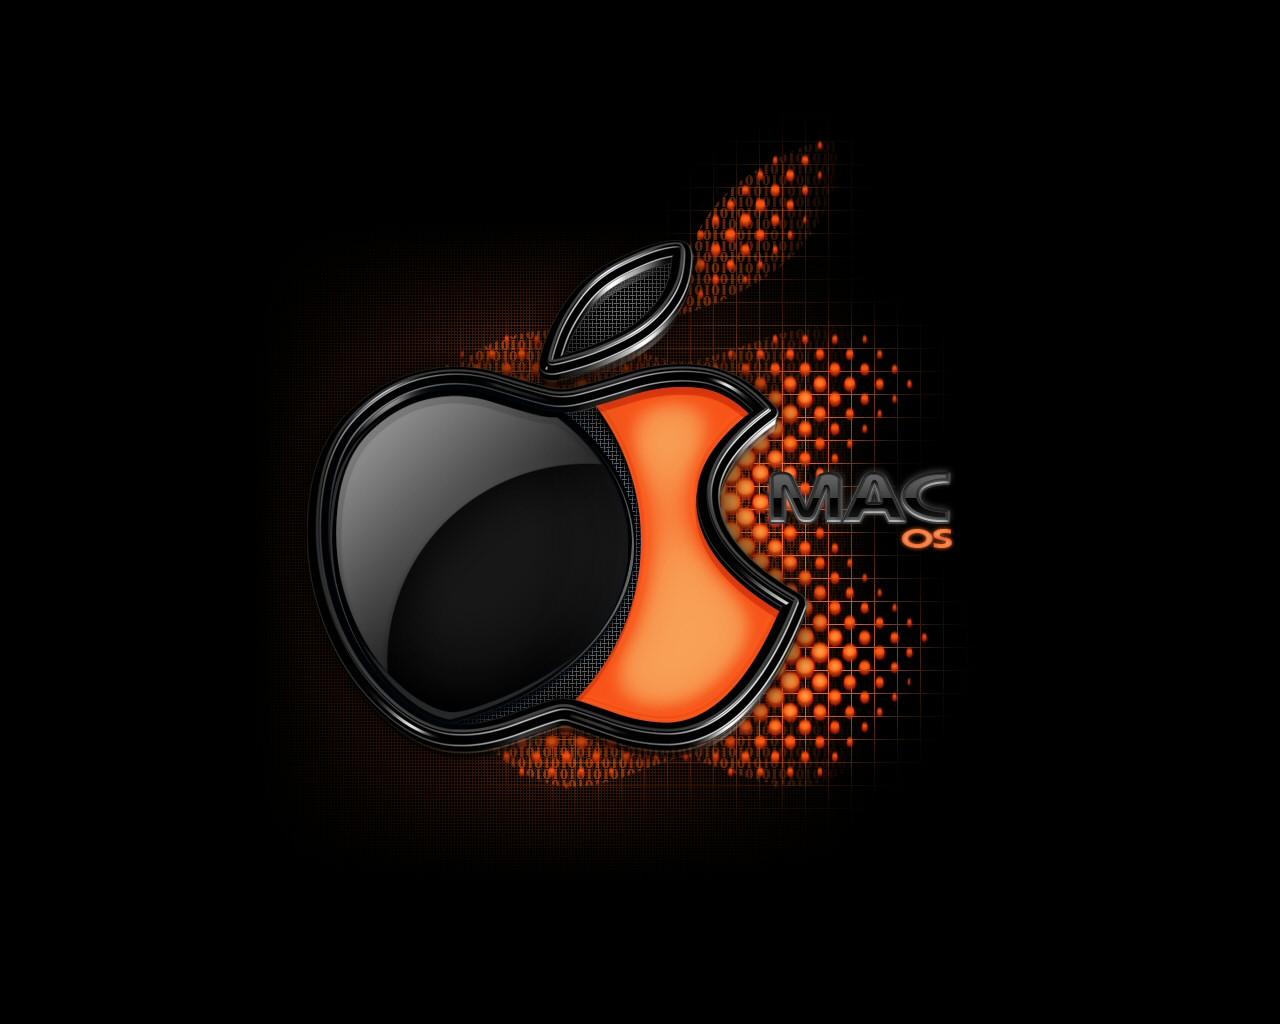 iPhone 6 Wallpaper HD 1080P